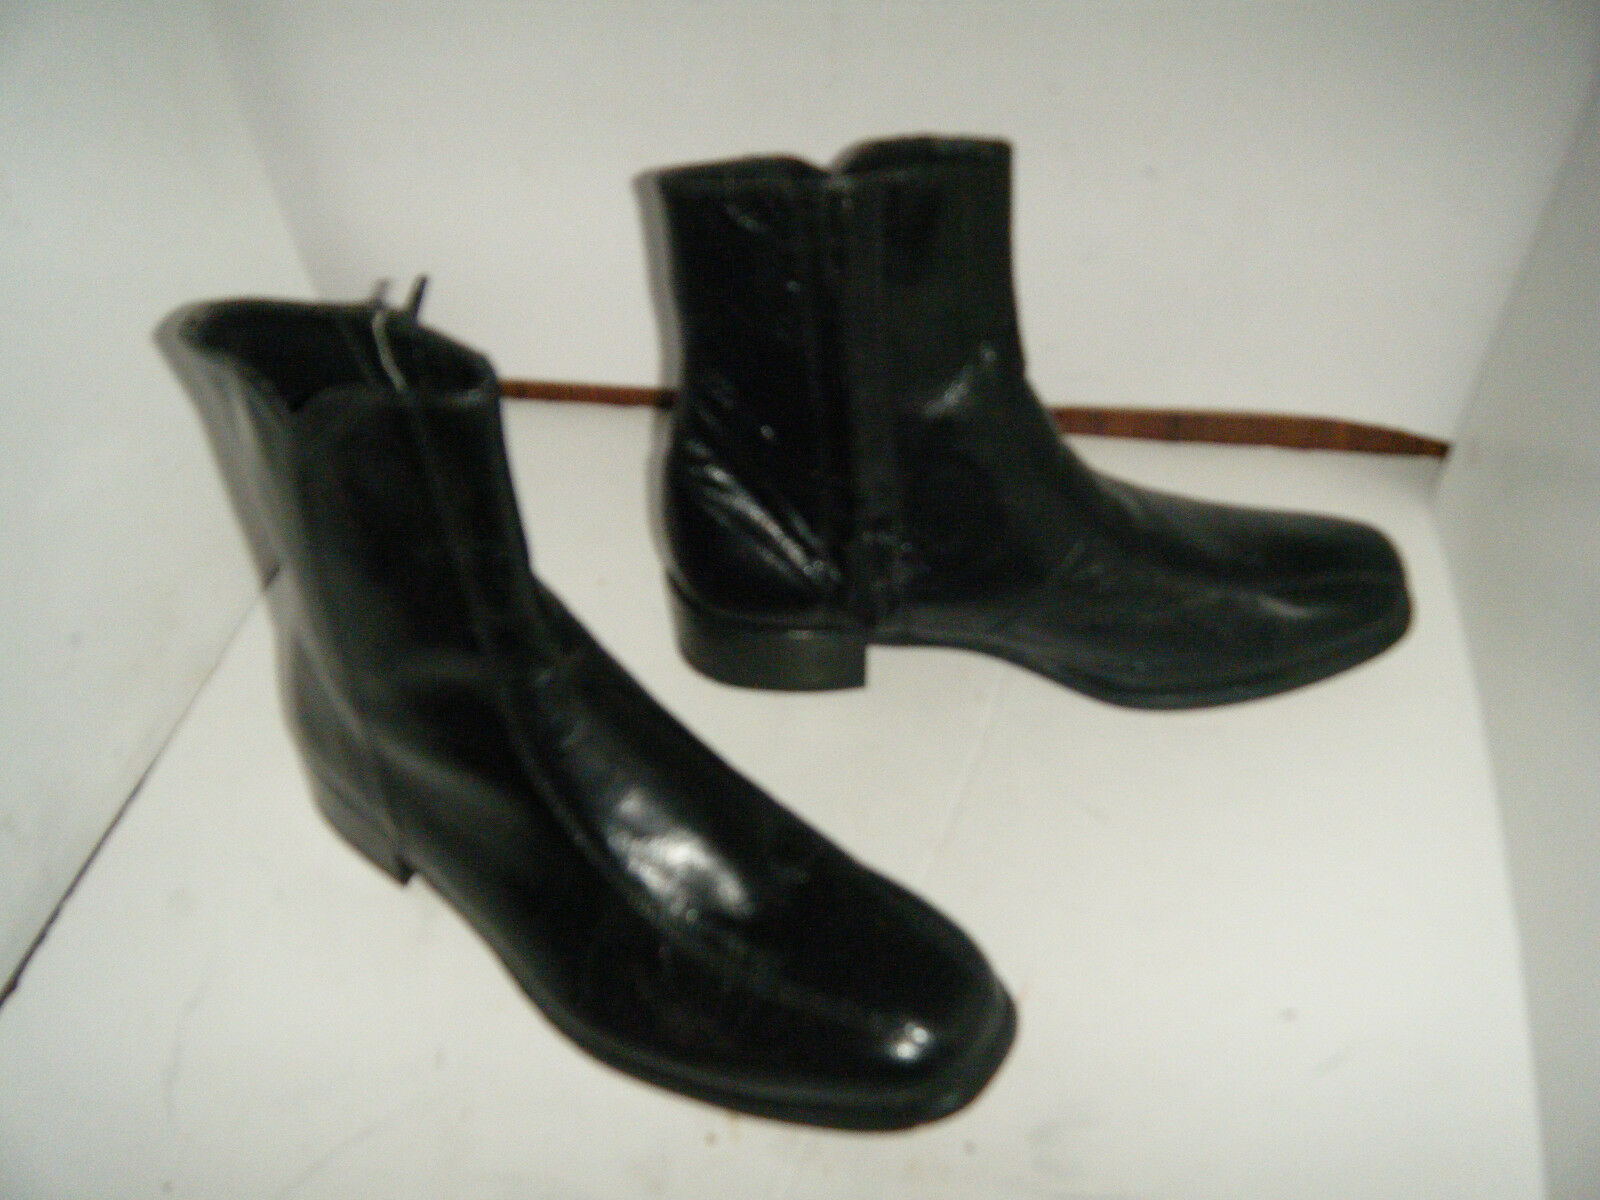 FLORESHEM Vintage schwarz leather zipper Ankle dress Stiefel Größe 8 D